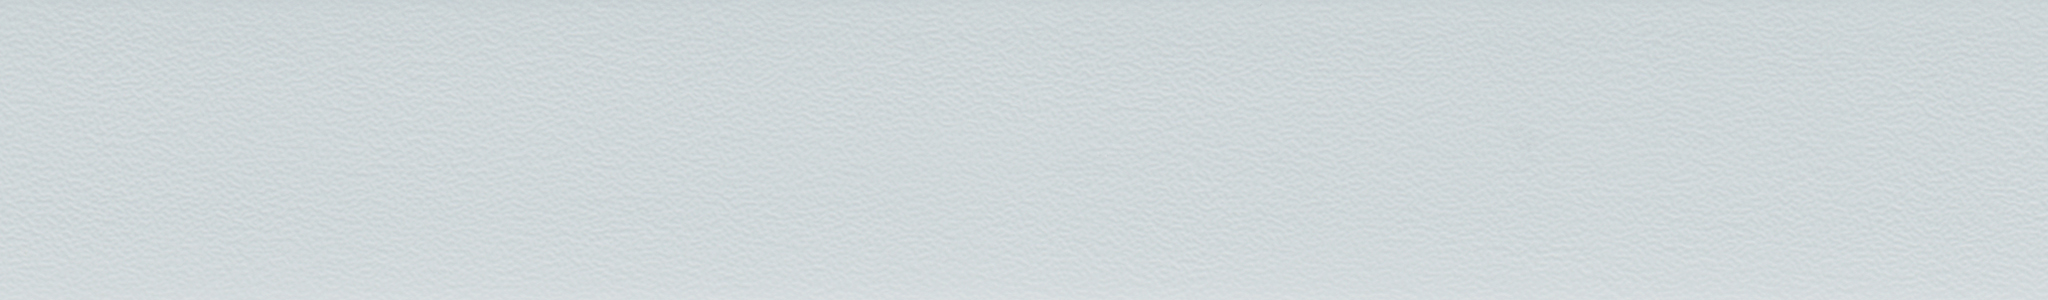 HU 17040 кромка ABS серая жемчуг 101